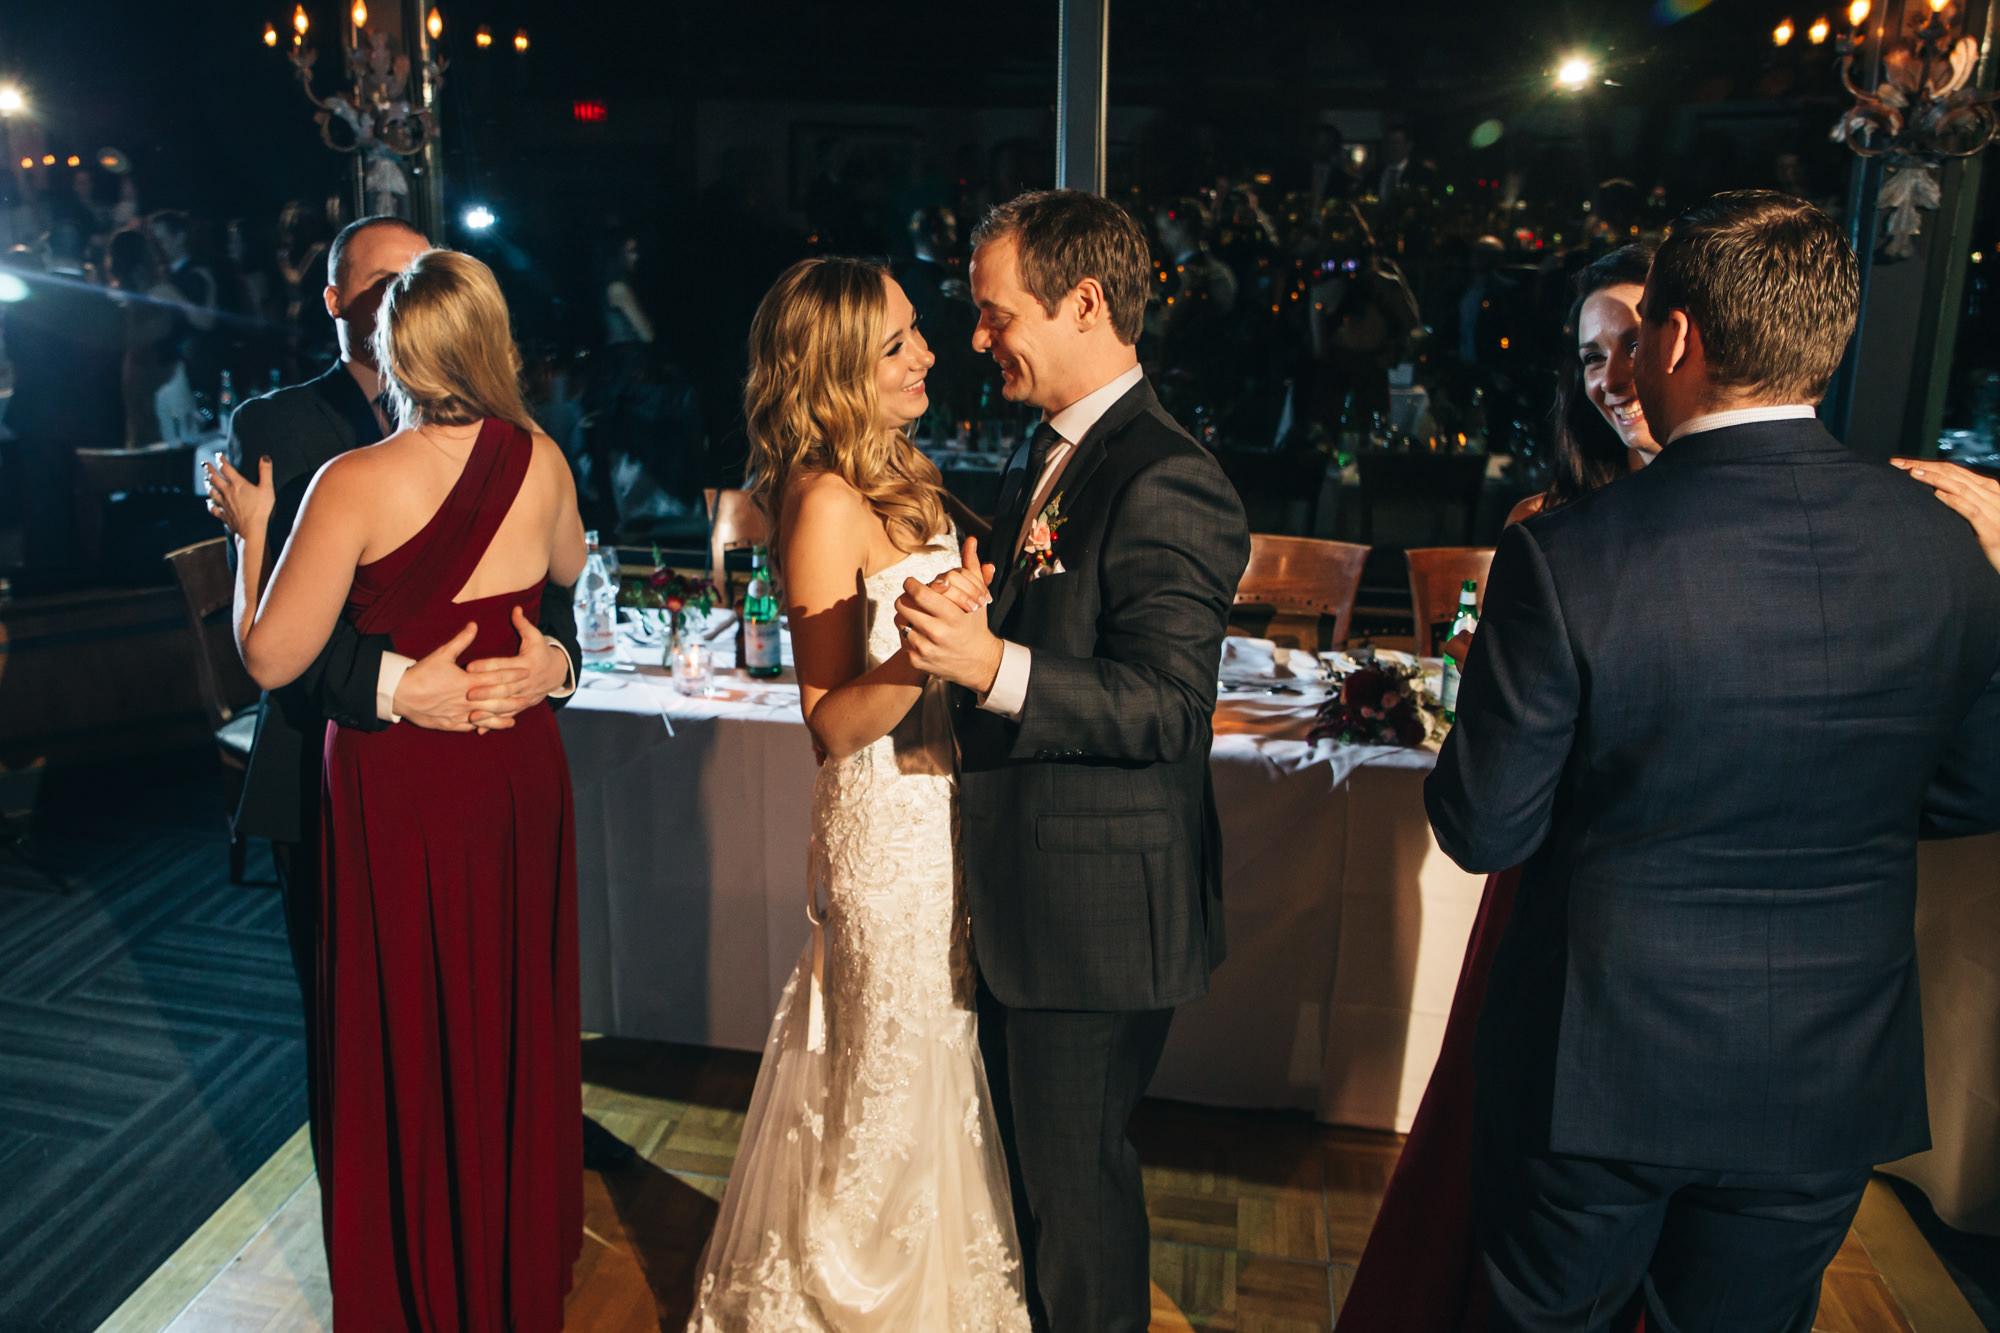 51-seasons-in-the-park-wedding-reception.jpg